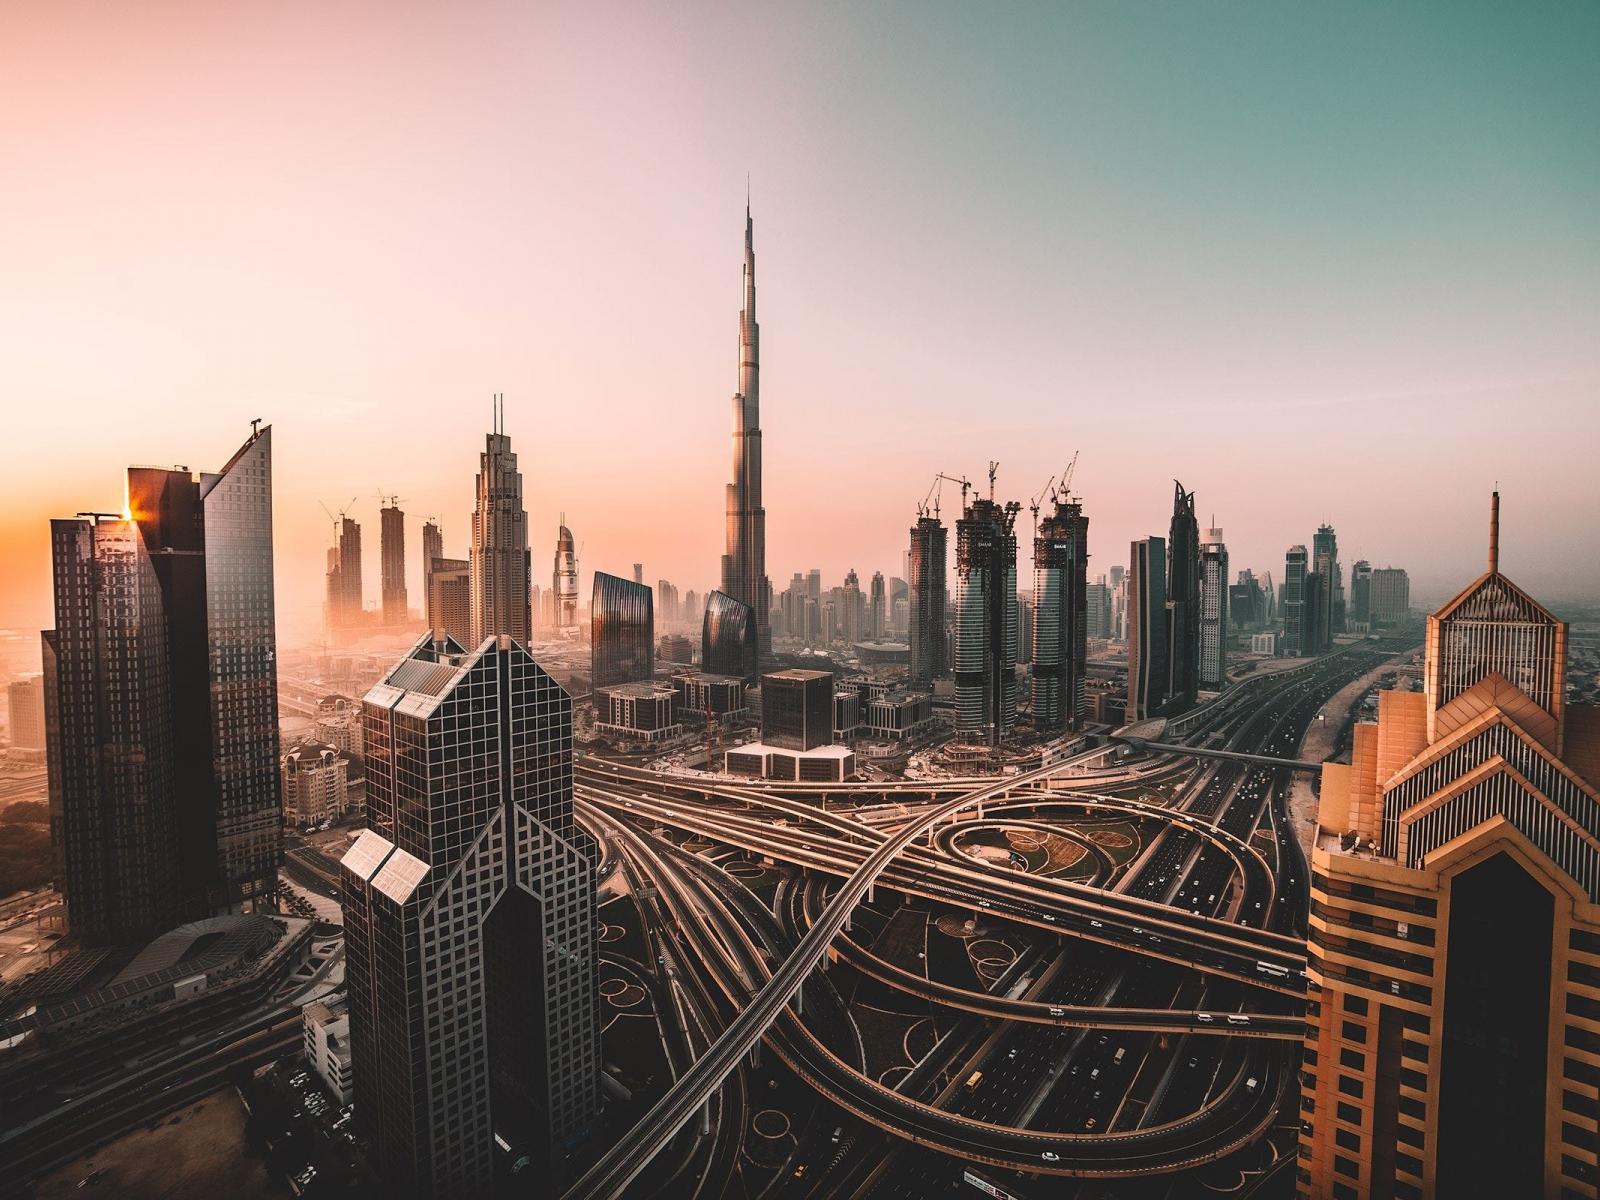 Dubai, skyline, cityscape, skyscrapers, buildings, Burj Khalifa, city, 1600x1200 wallpaper